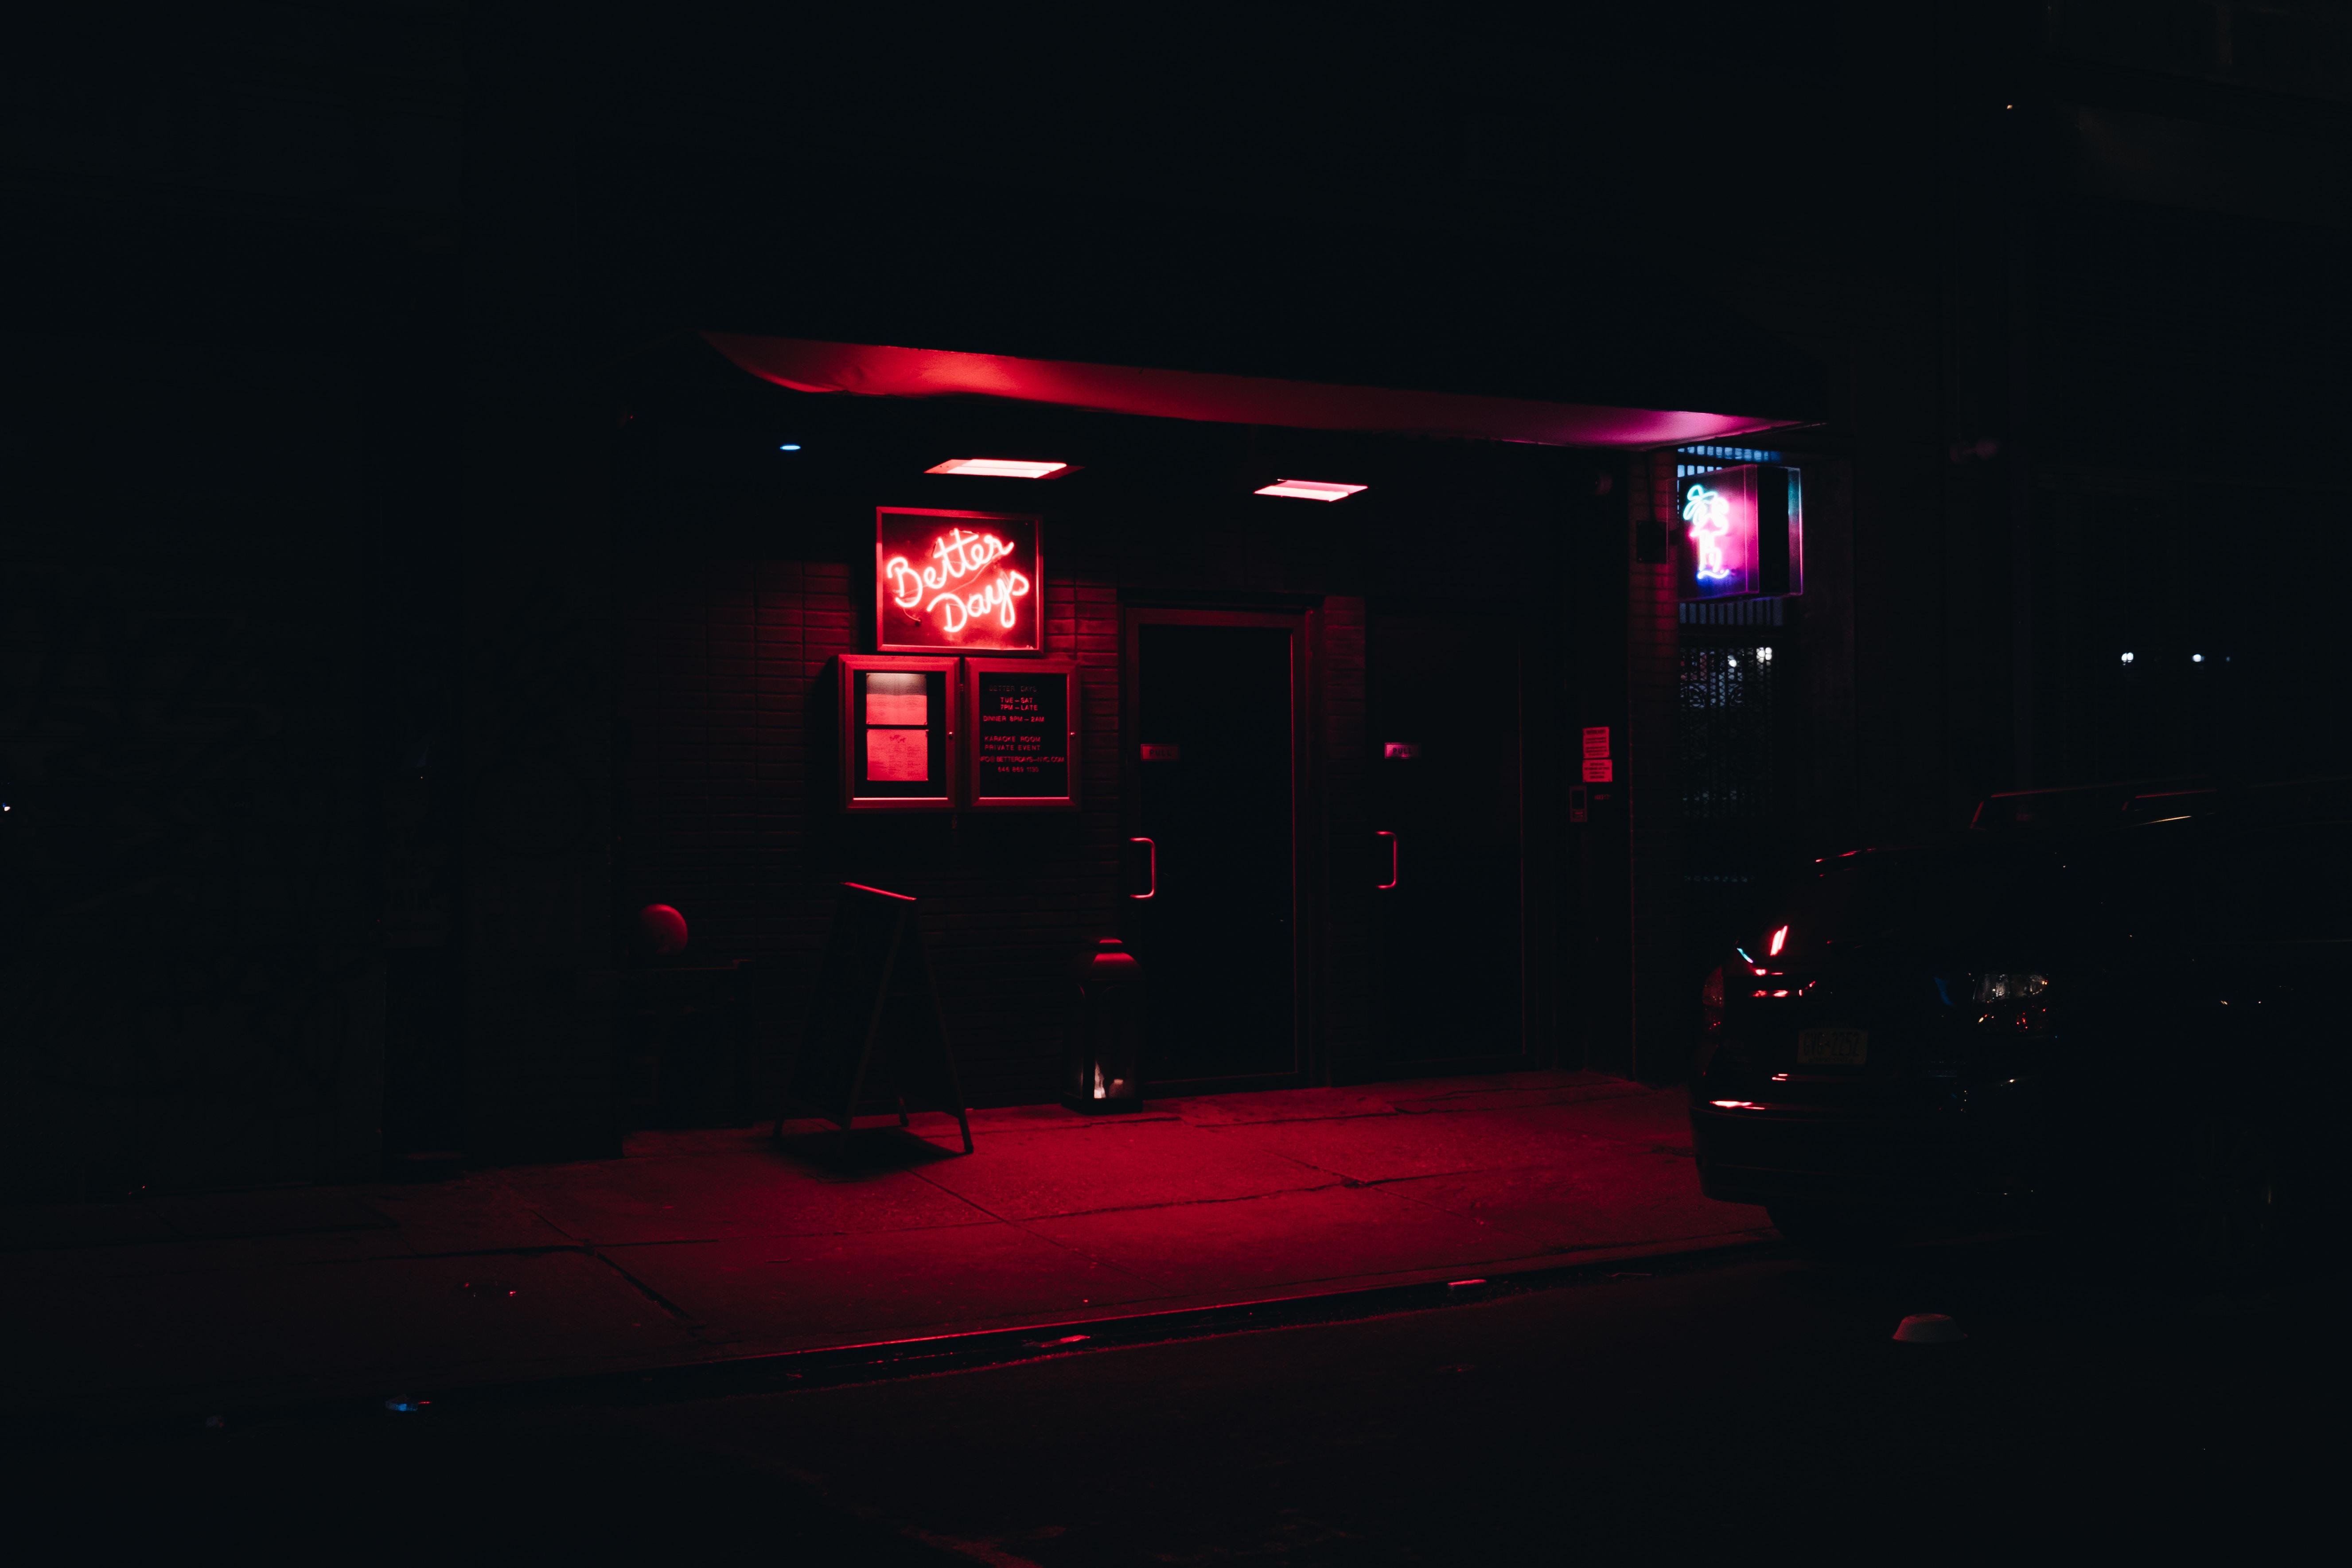 Better Days neon light signage bars